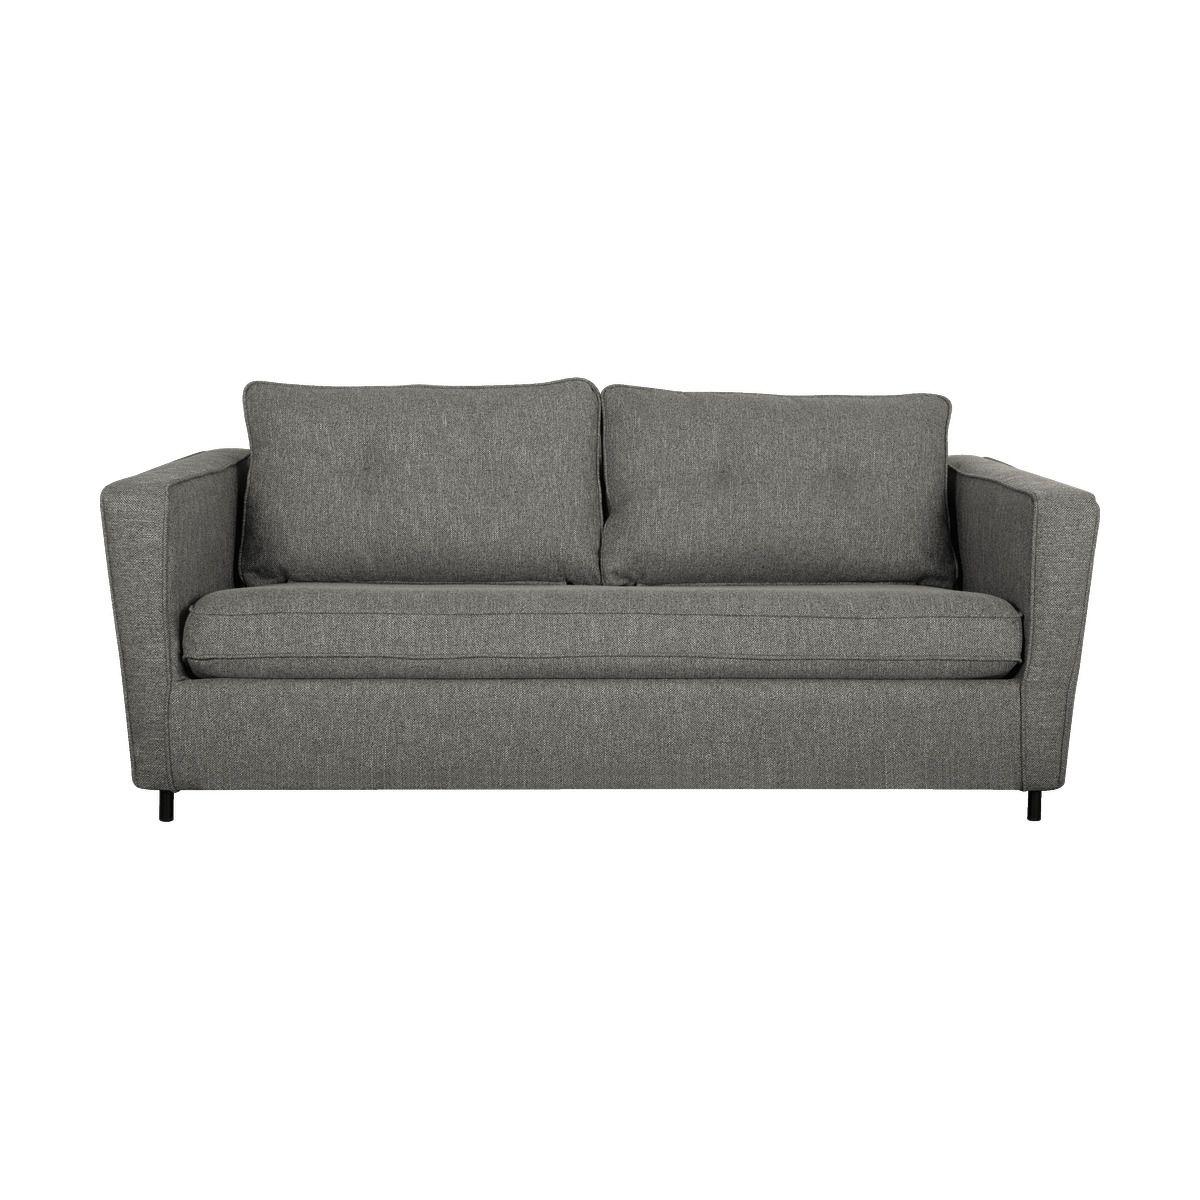 Confort Distingue Un Canape Convertible En Tissu Inspire Des